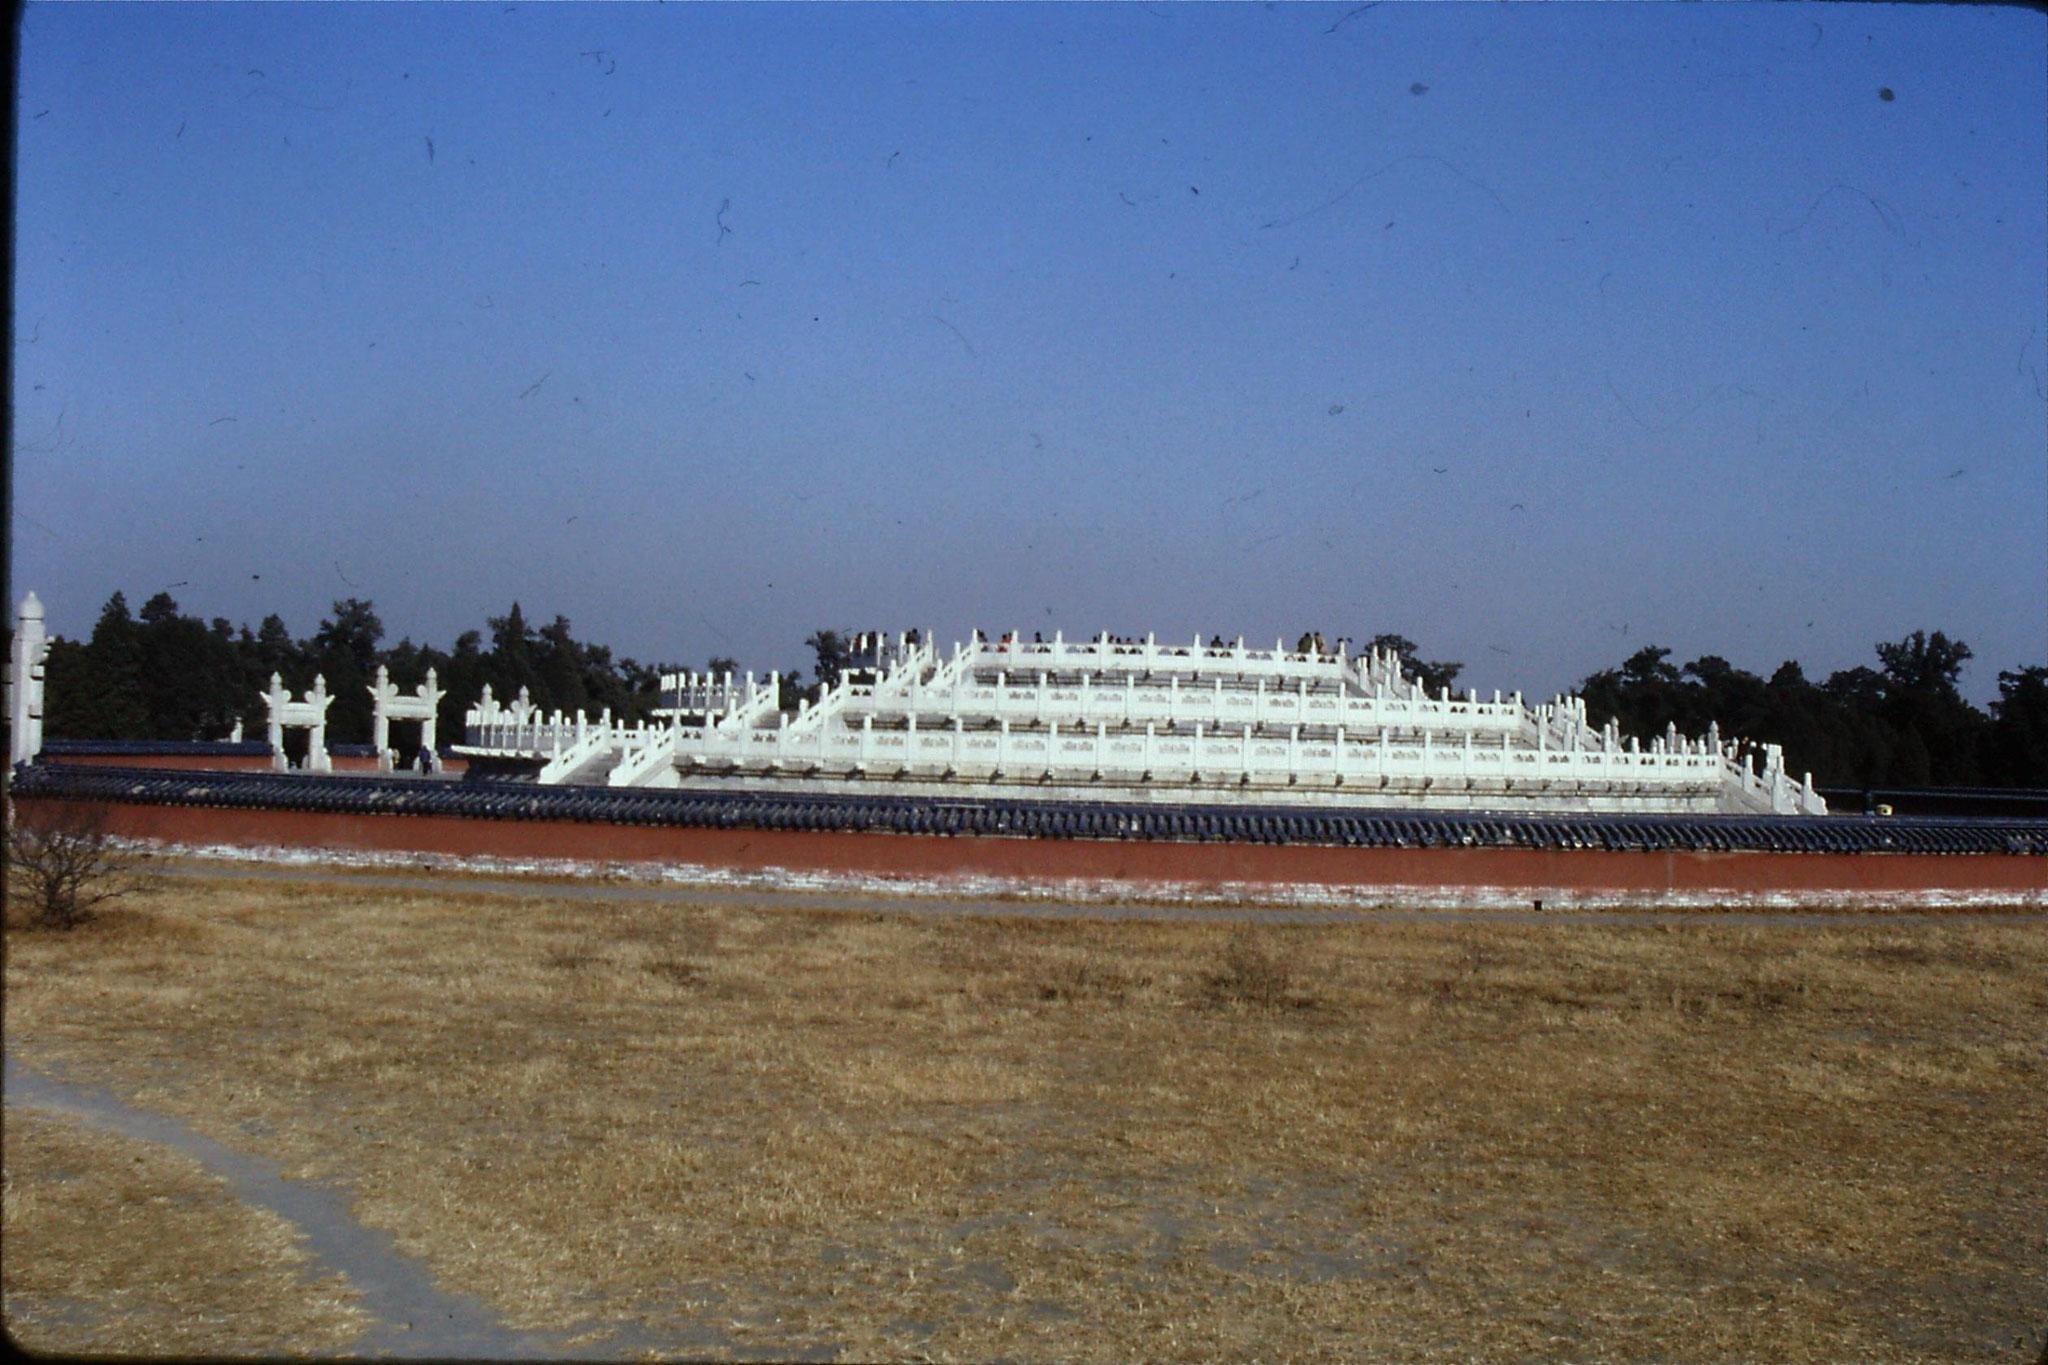 2/12/1988: 14: Tiantan Park